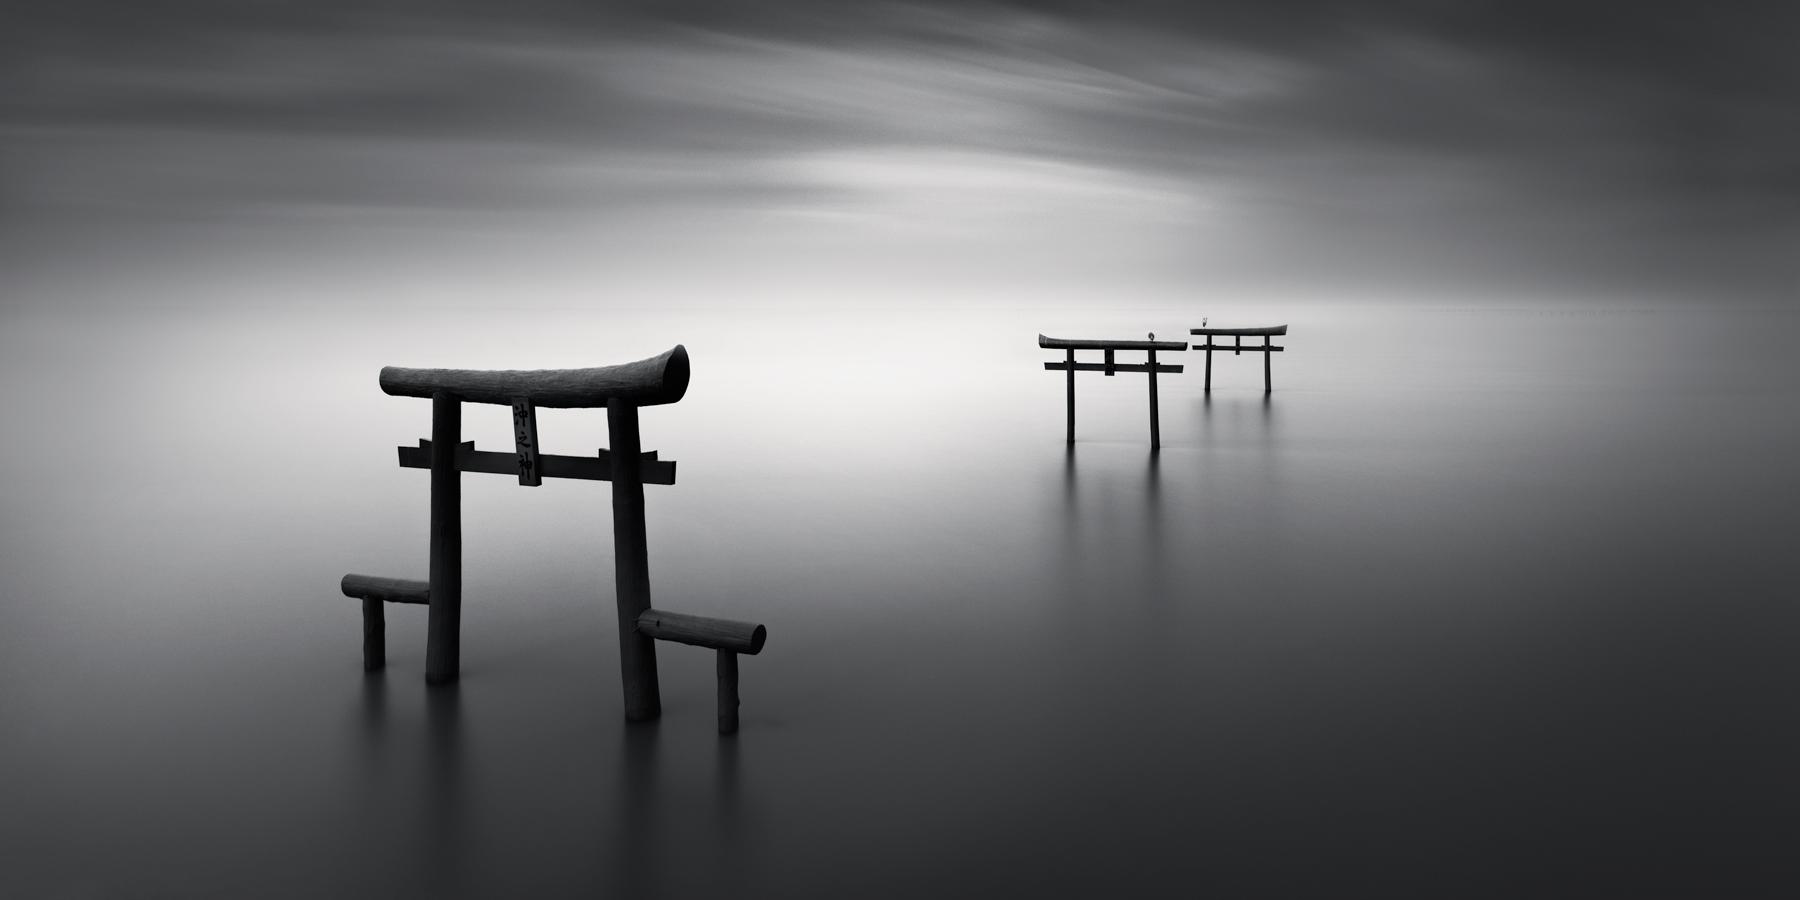 Eriko_Kaniwa_SpiritualLandscape_2.jpg